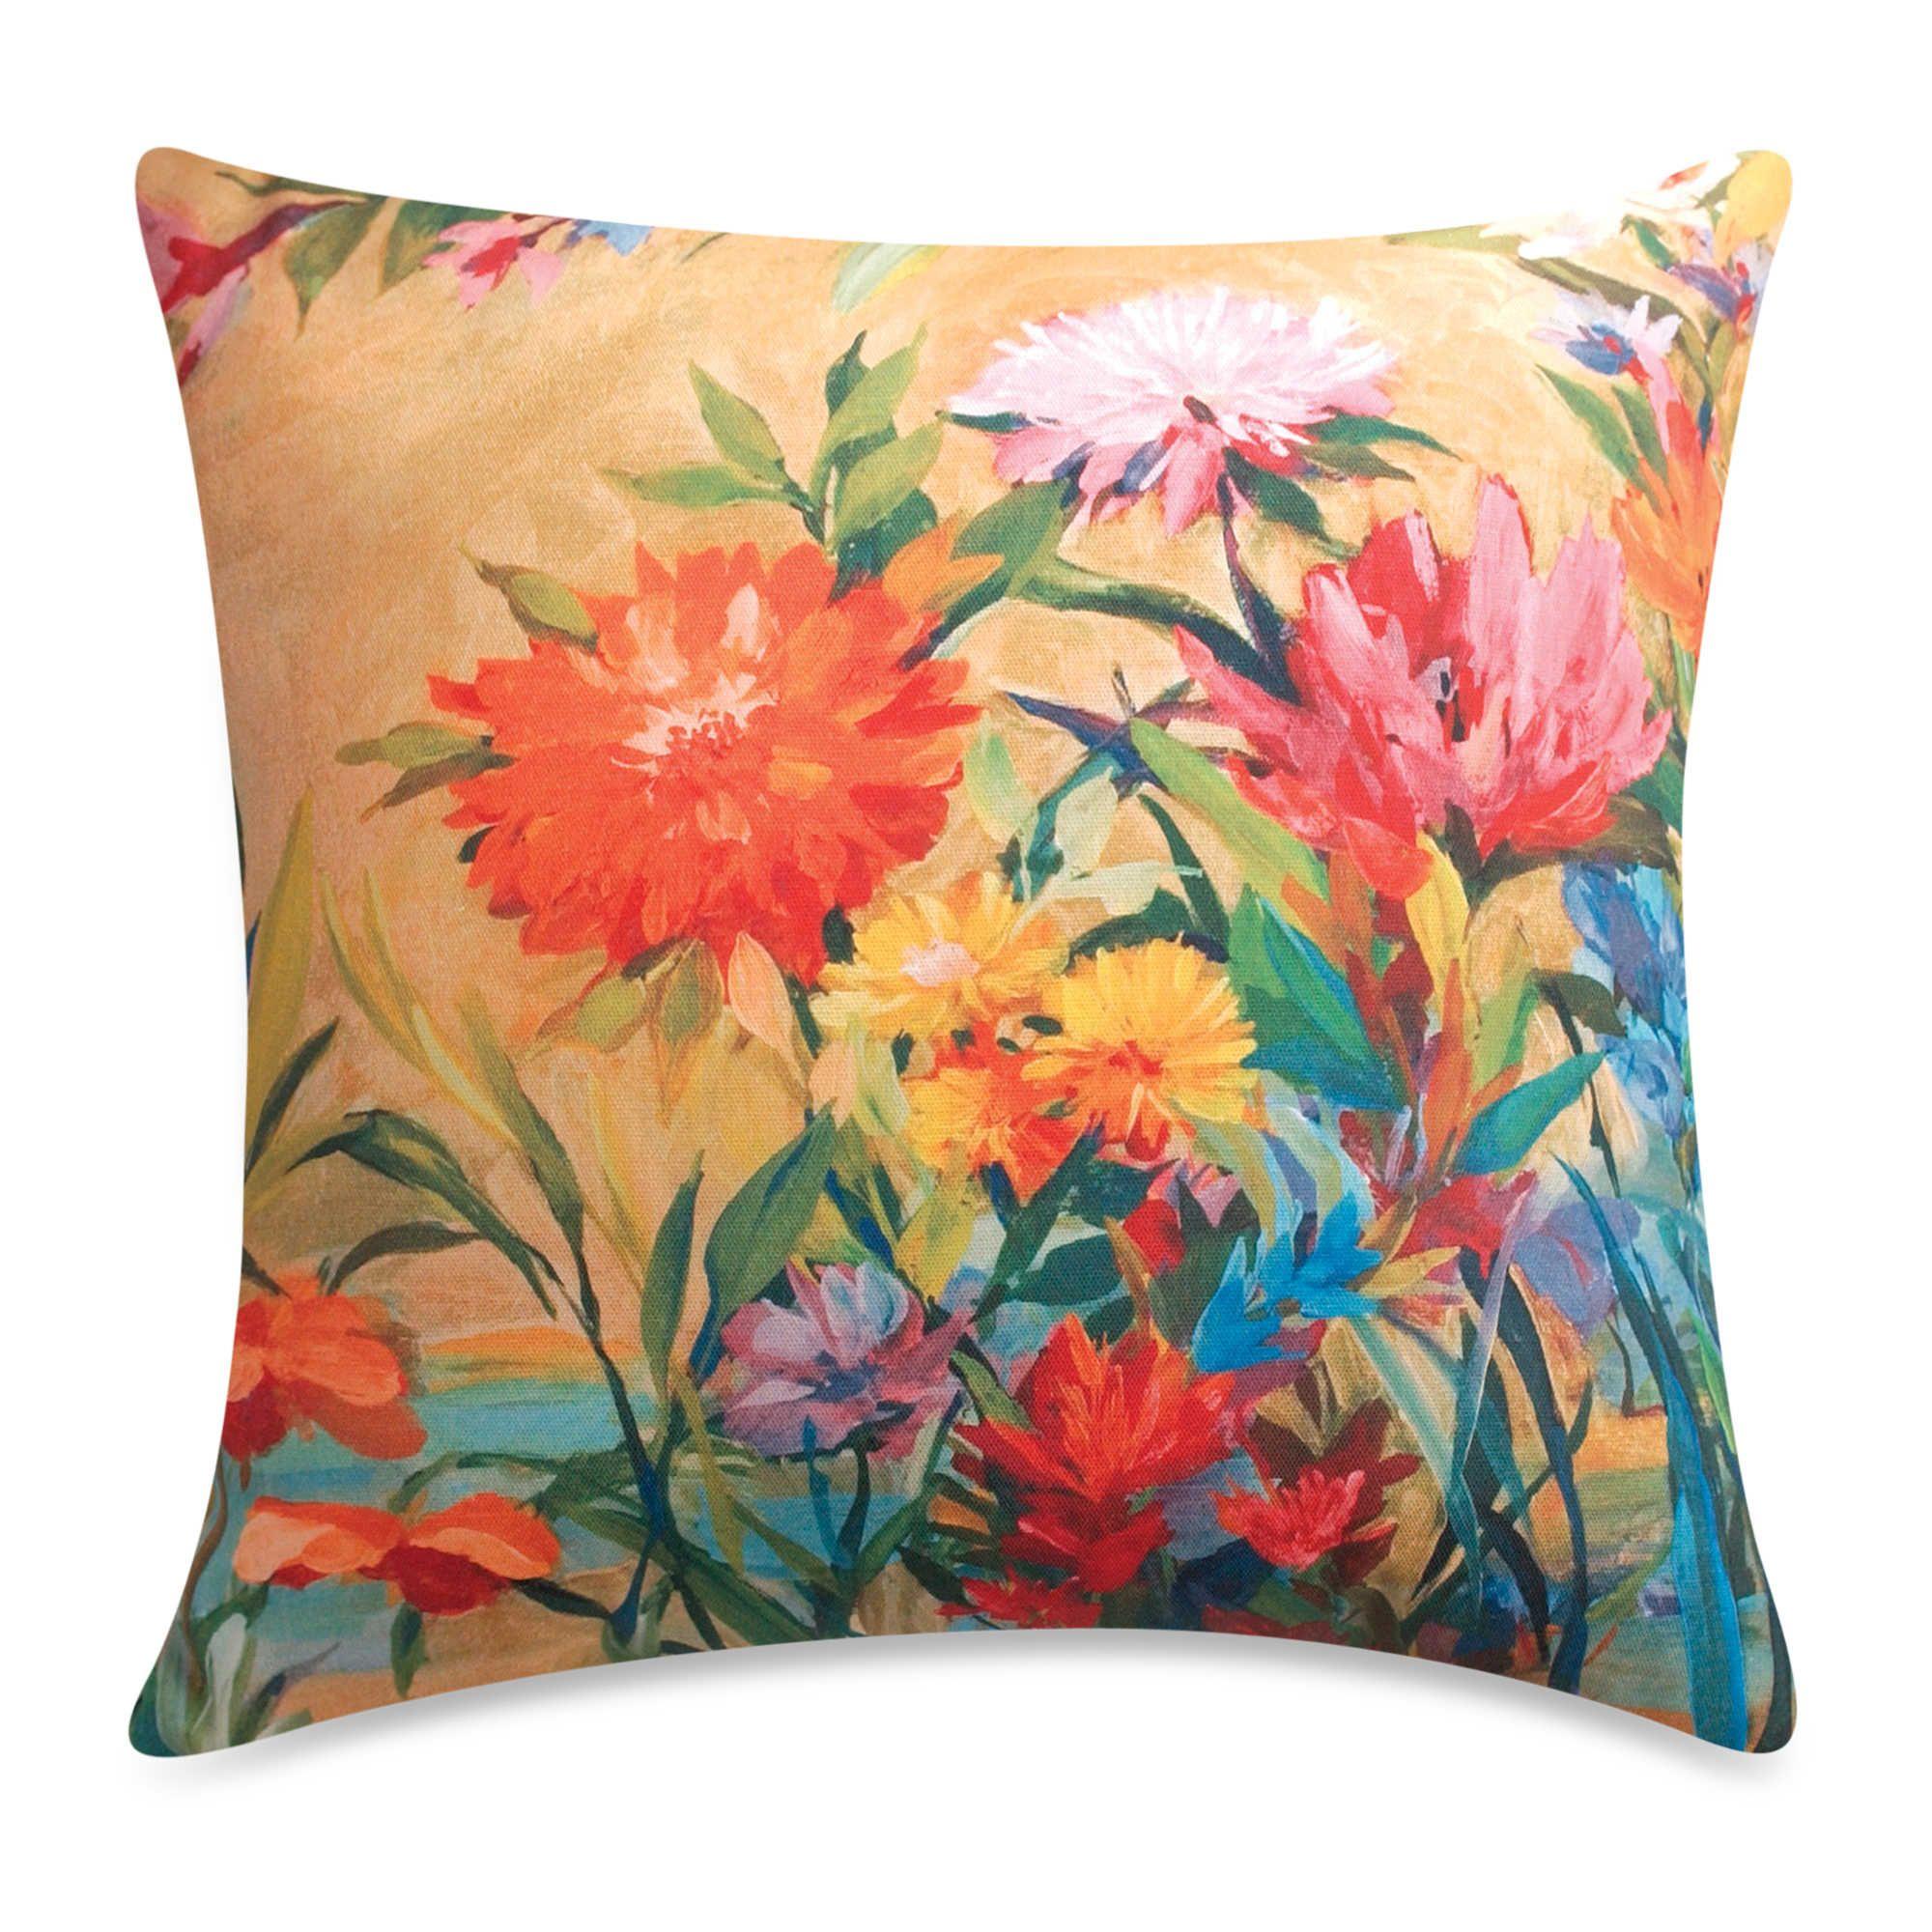 Outdoor Throw Pillow   Floral throw